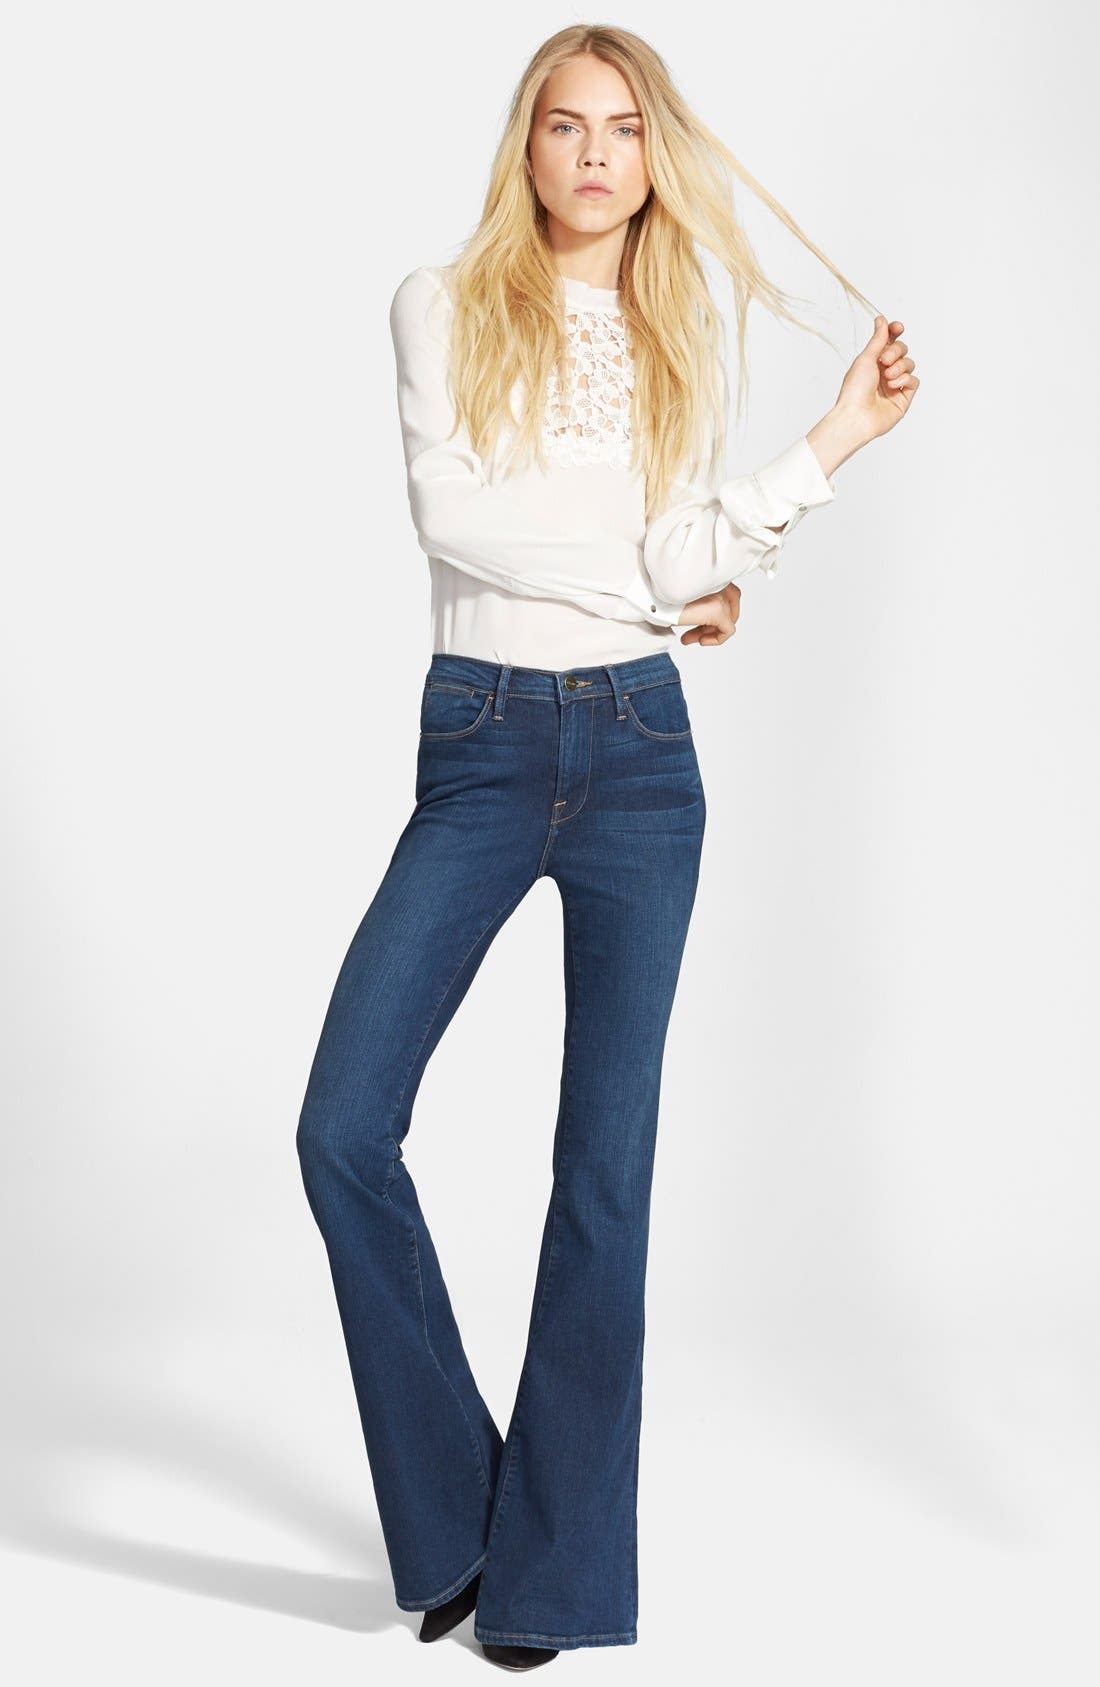 FRAME, Denim 'Le High Flare' Flare Leg Jeans, Alternate thumbnail 3, color, 401